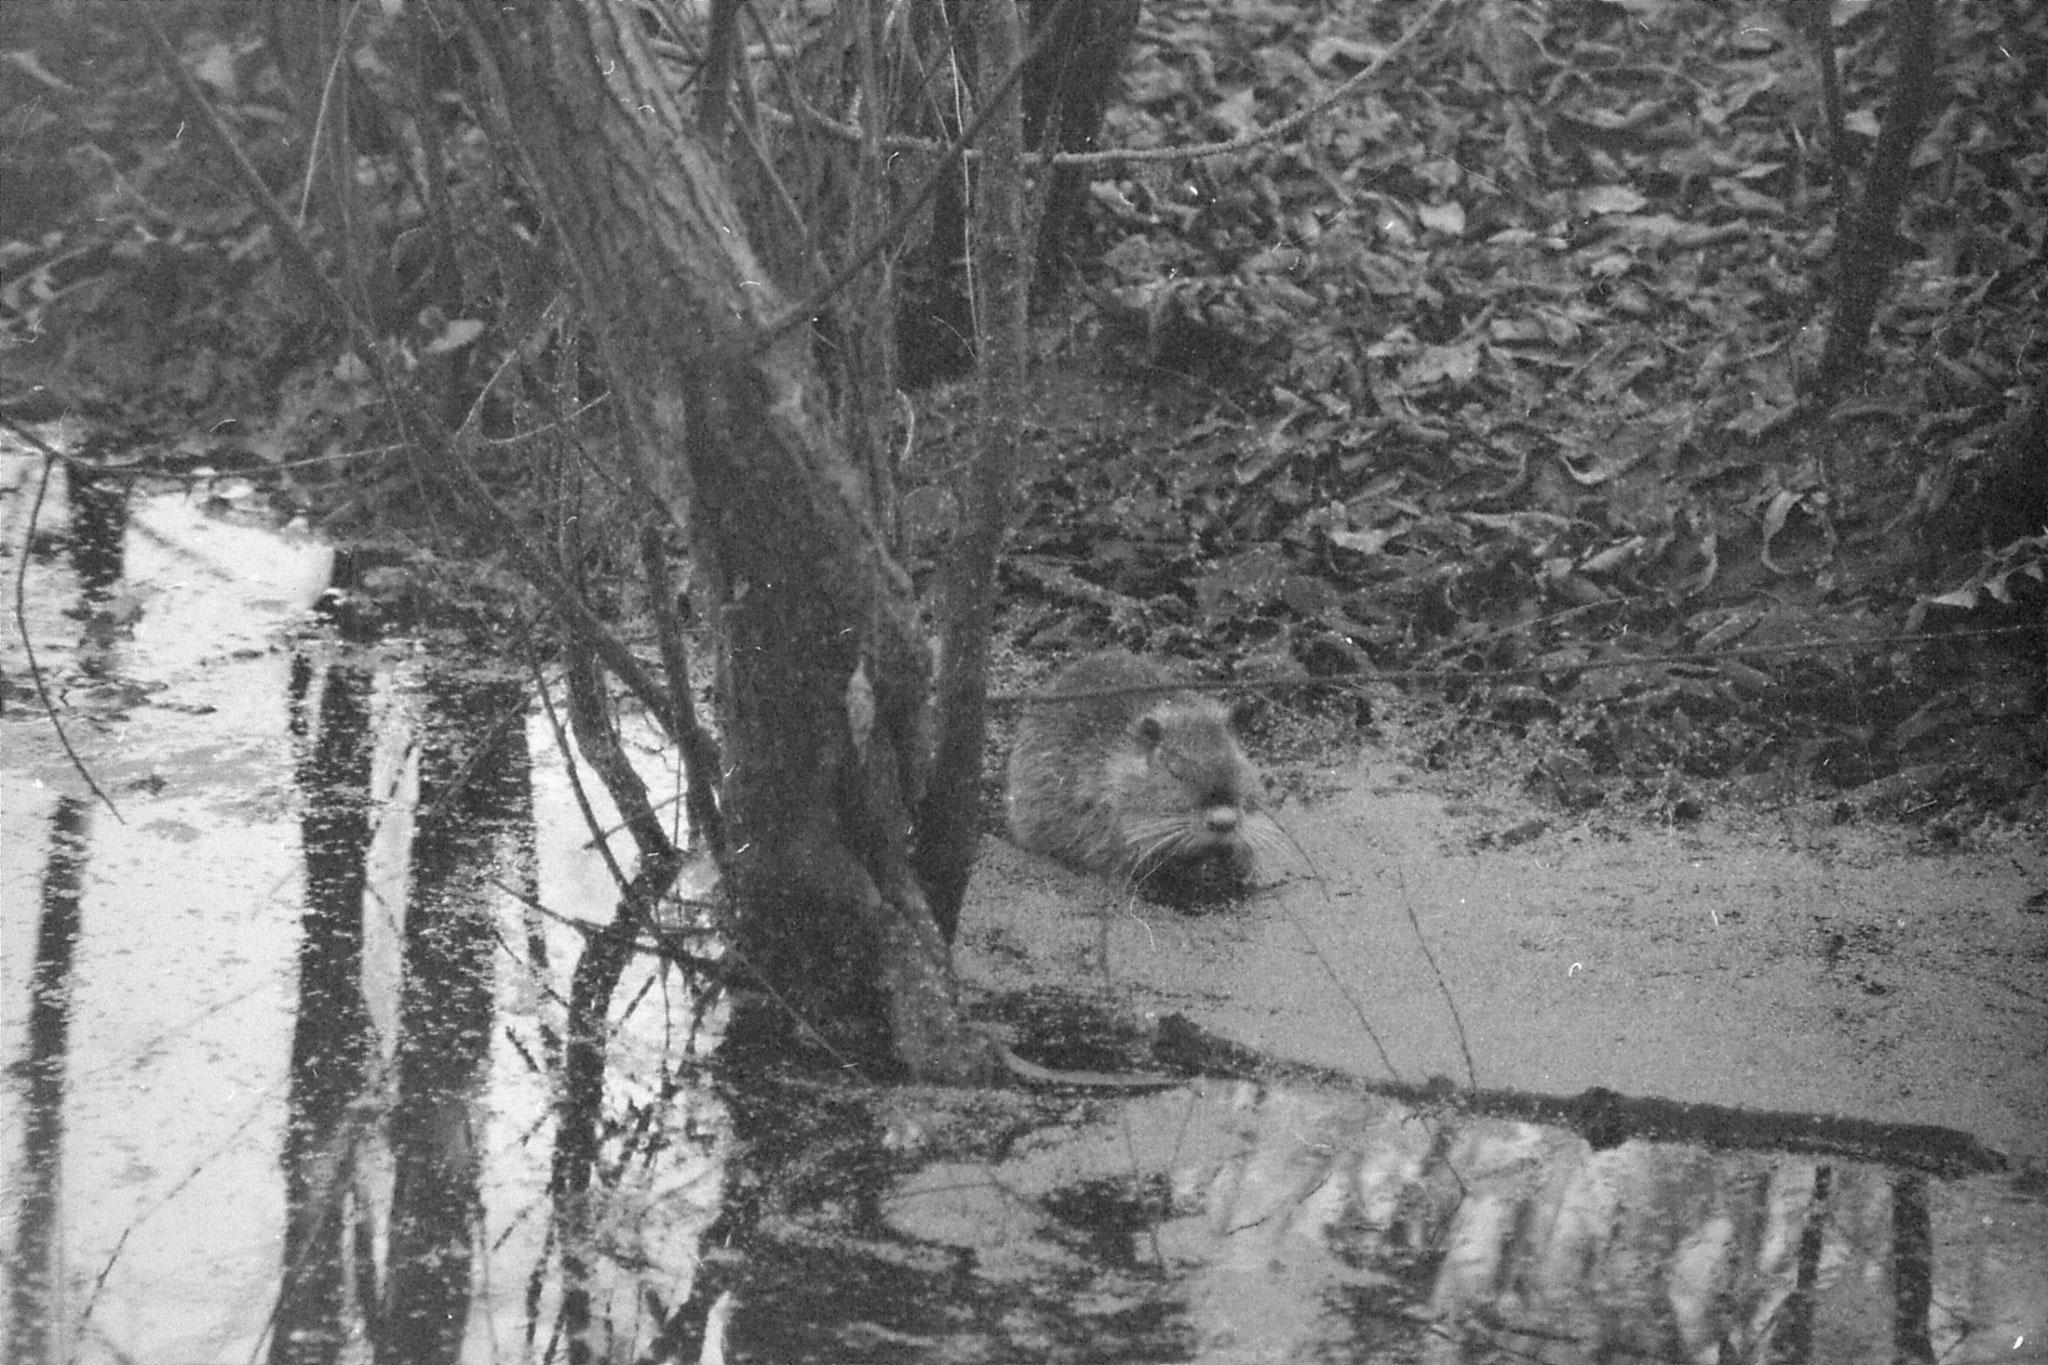 13/1/1991: 1: St Bernard Louisiana State Park